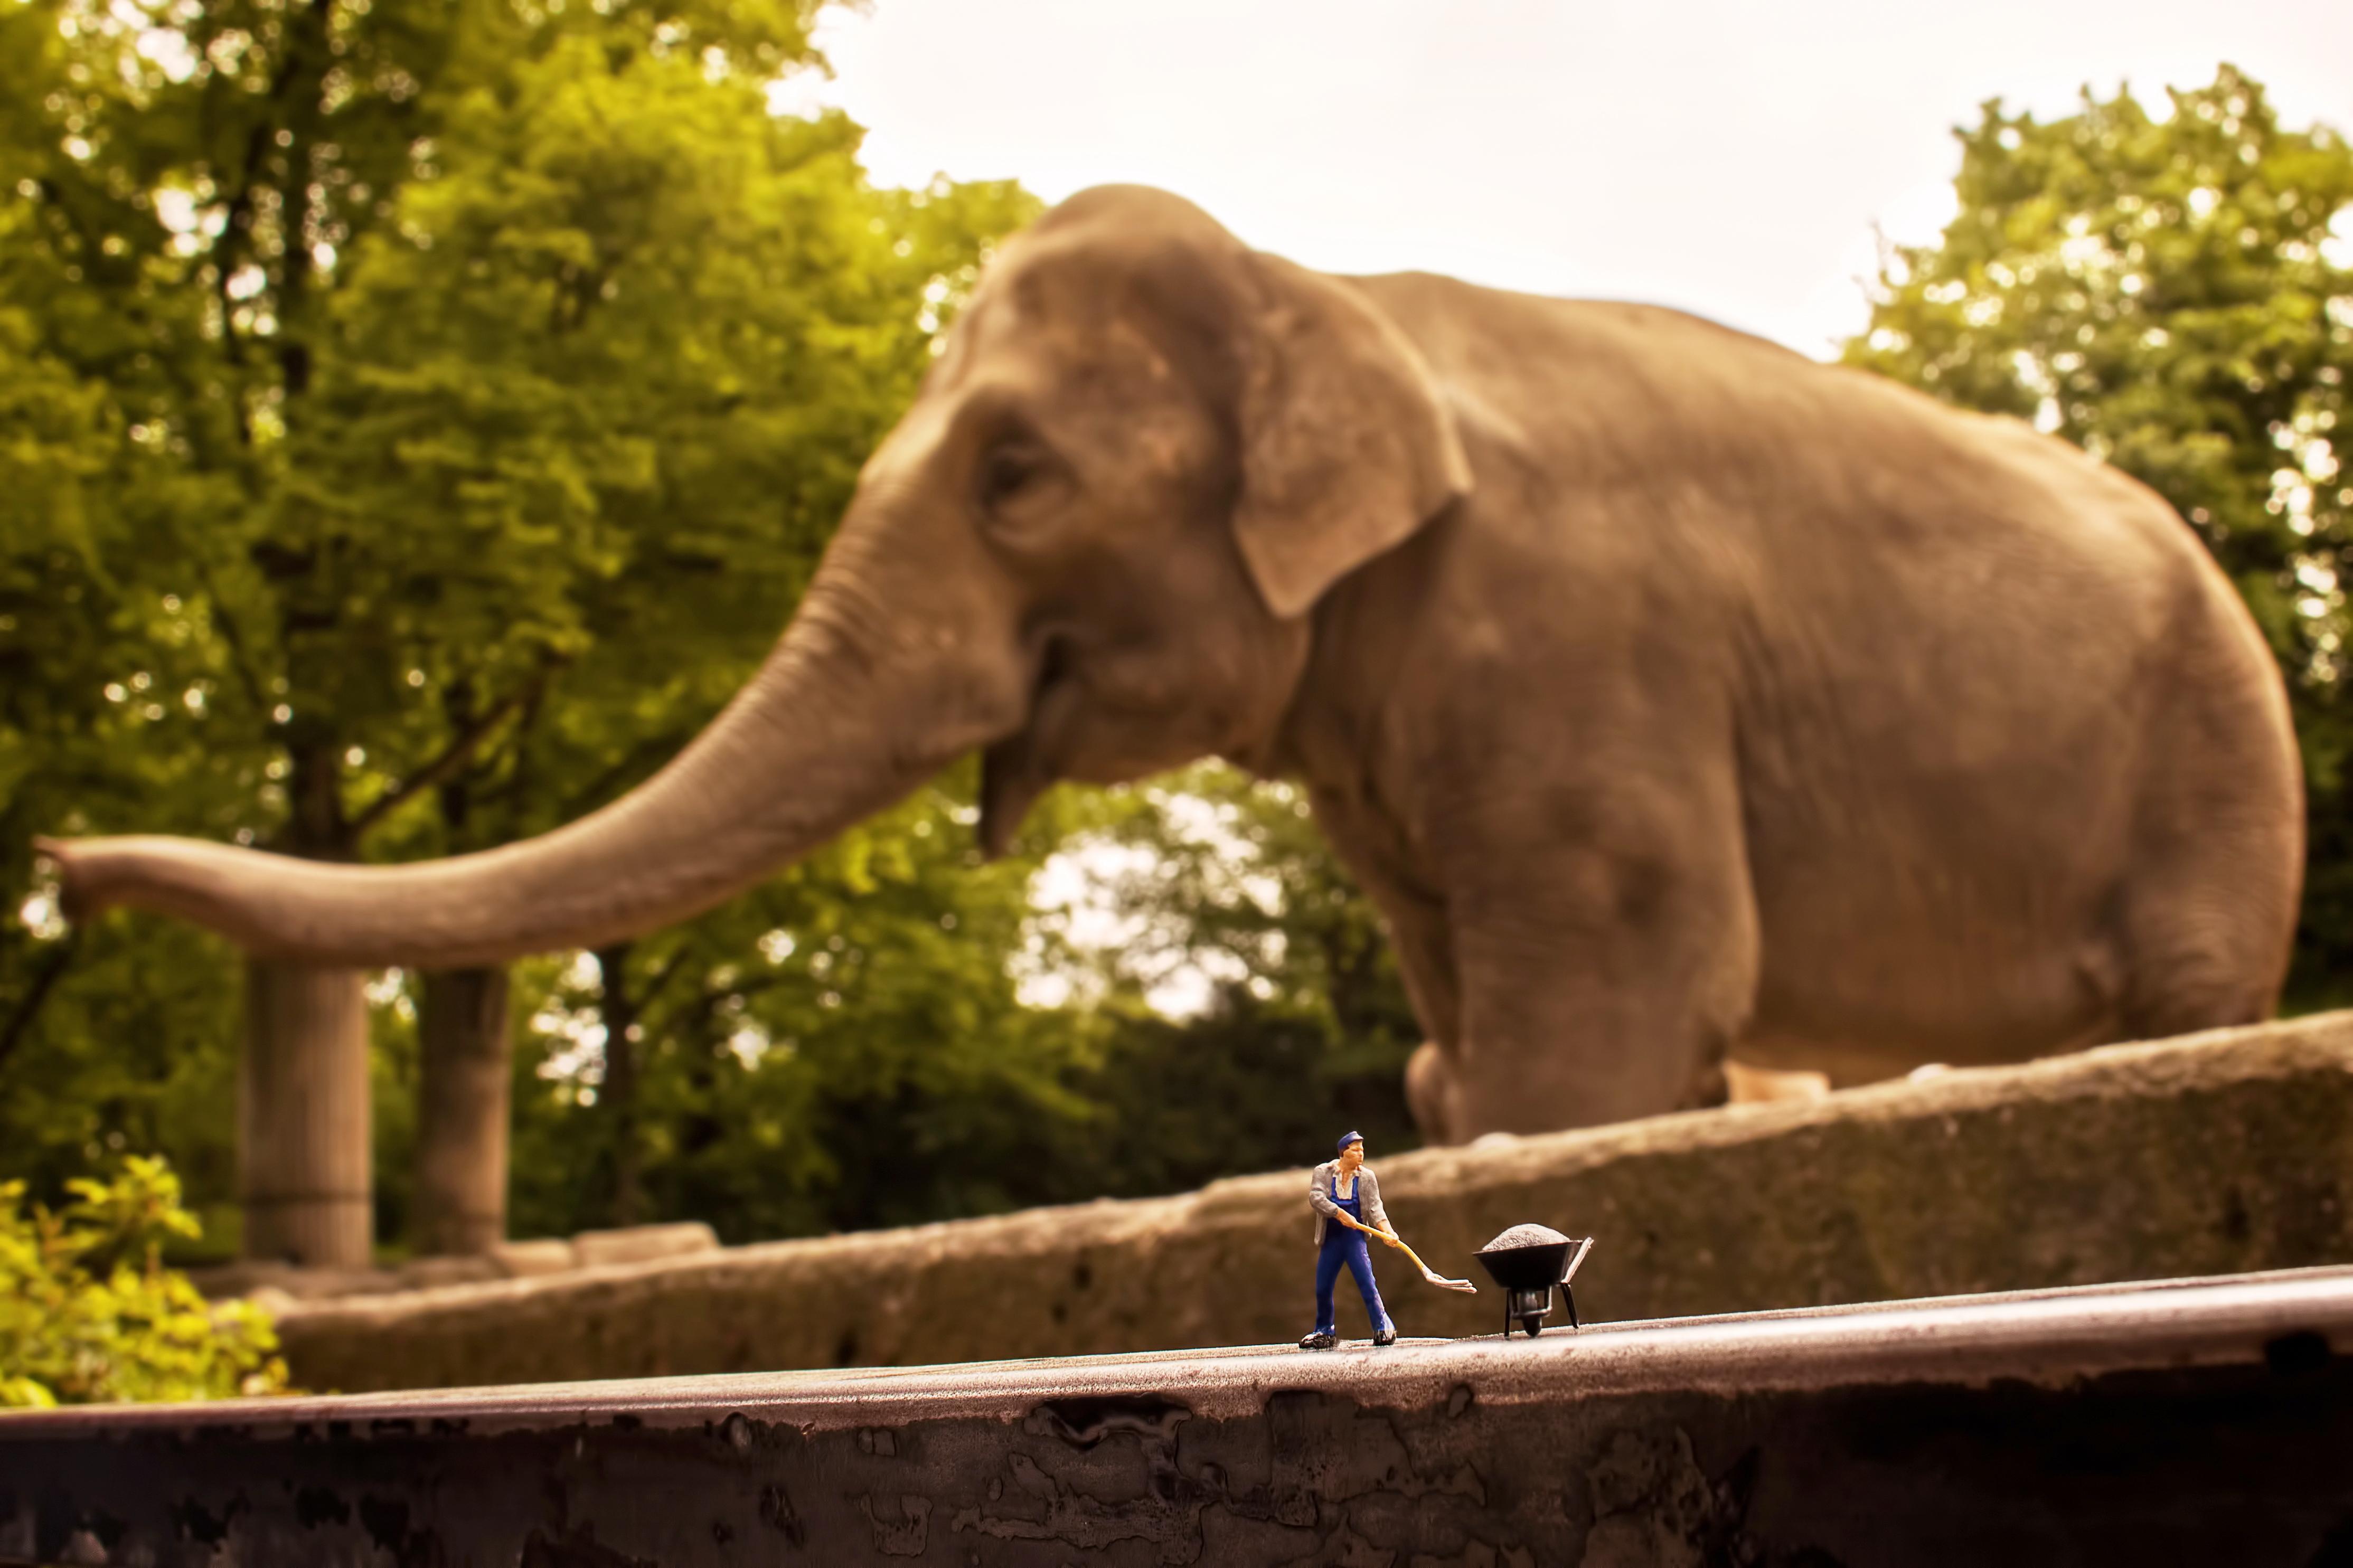 Elefantenpfleger